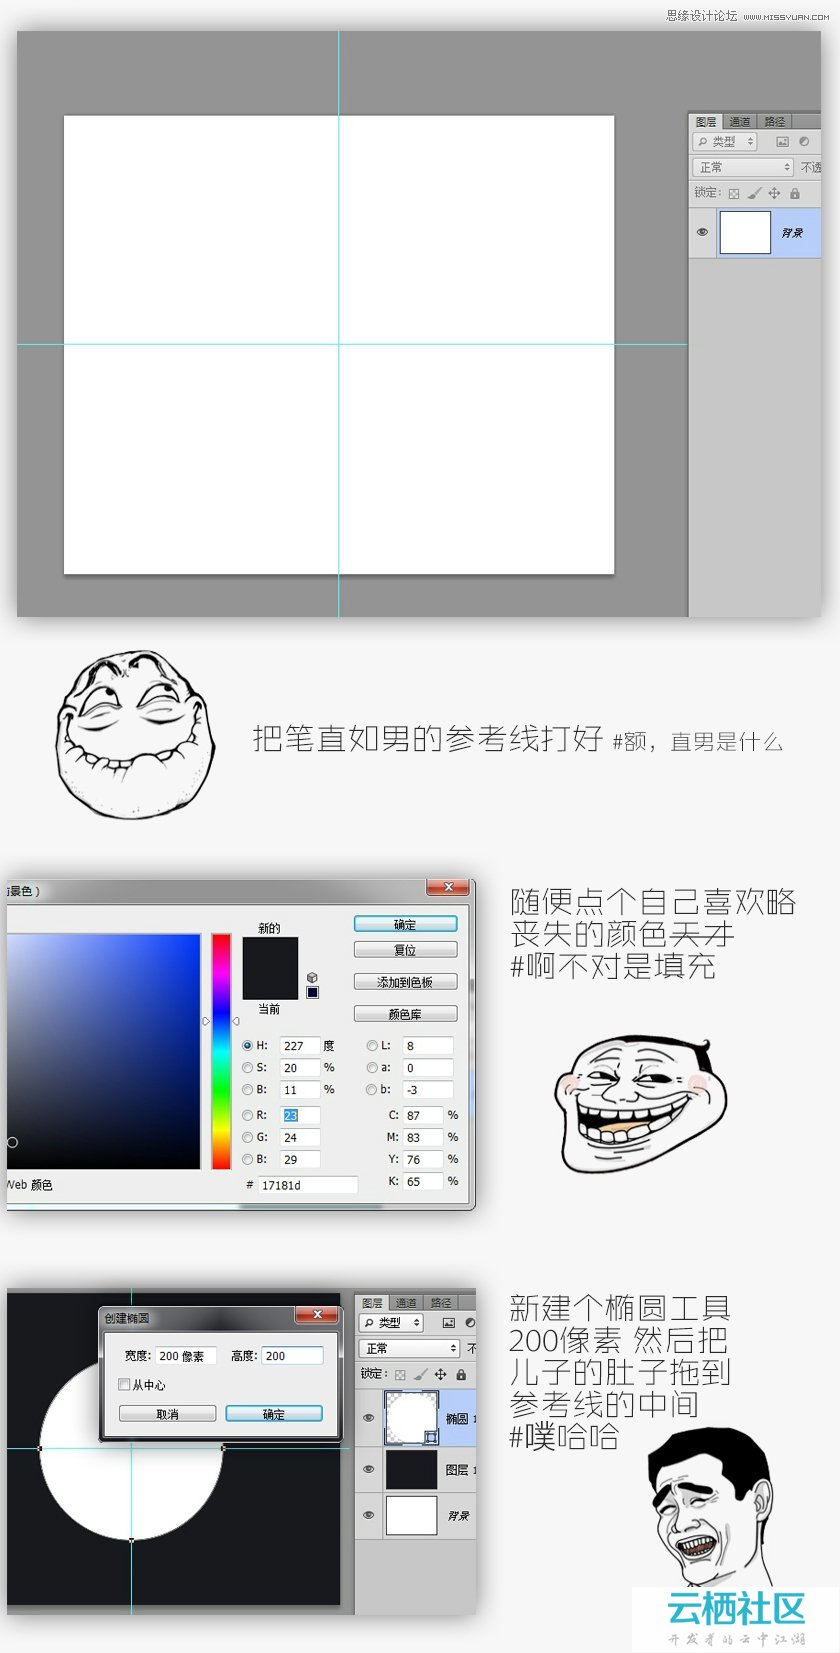 Photoshop绘制立体风格的快门镜头图标-photoshop 快门次数